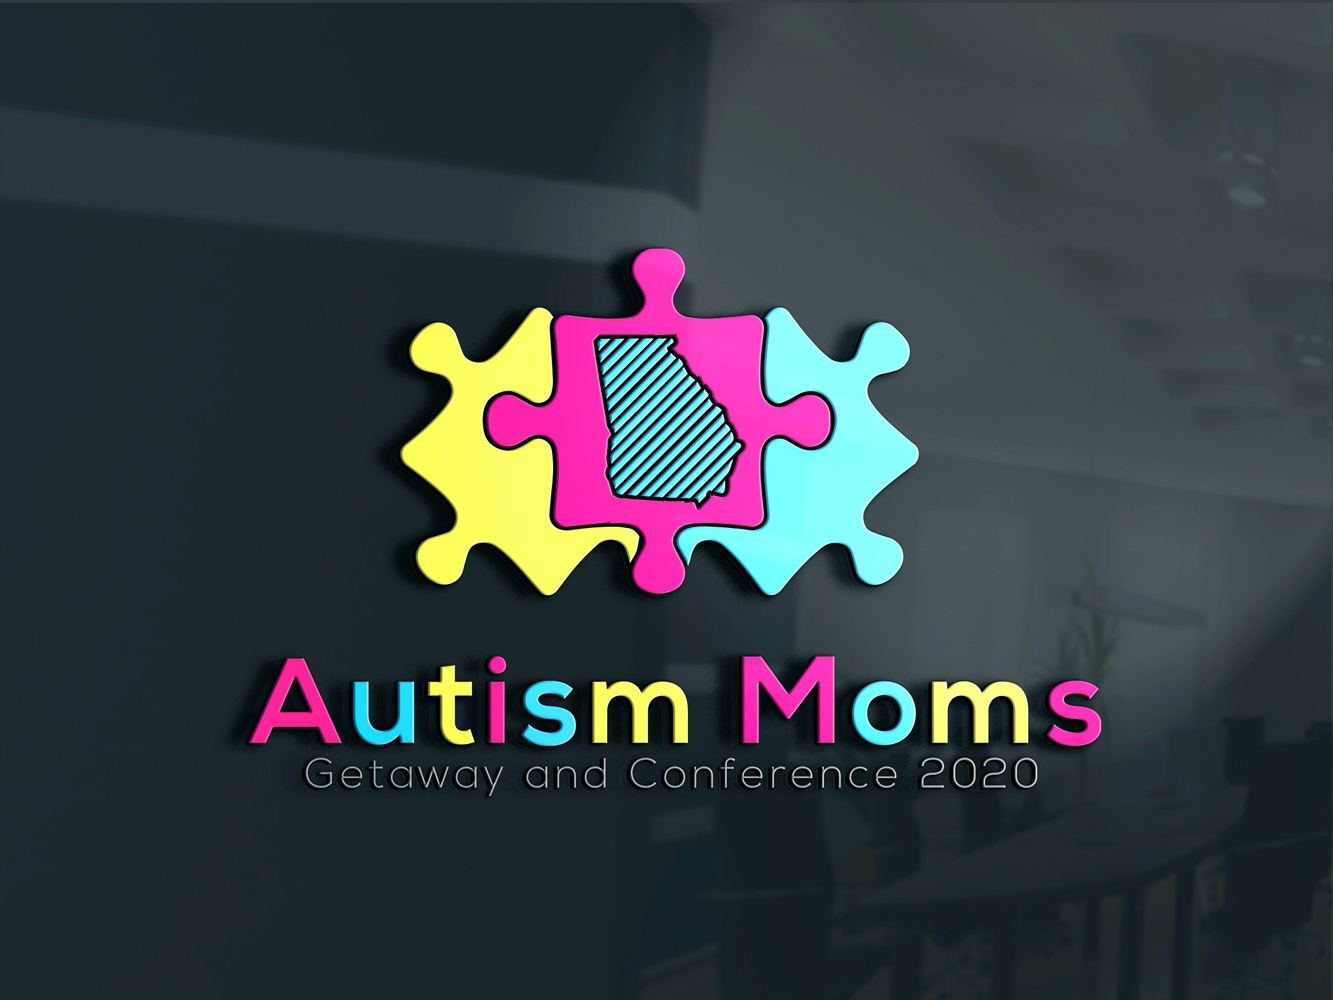 Autism Moms Getaway - Atlanta 2020